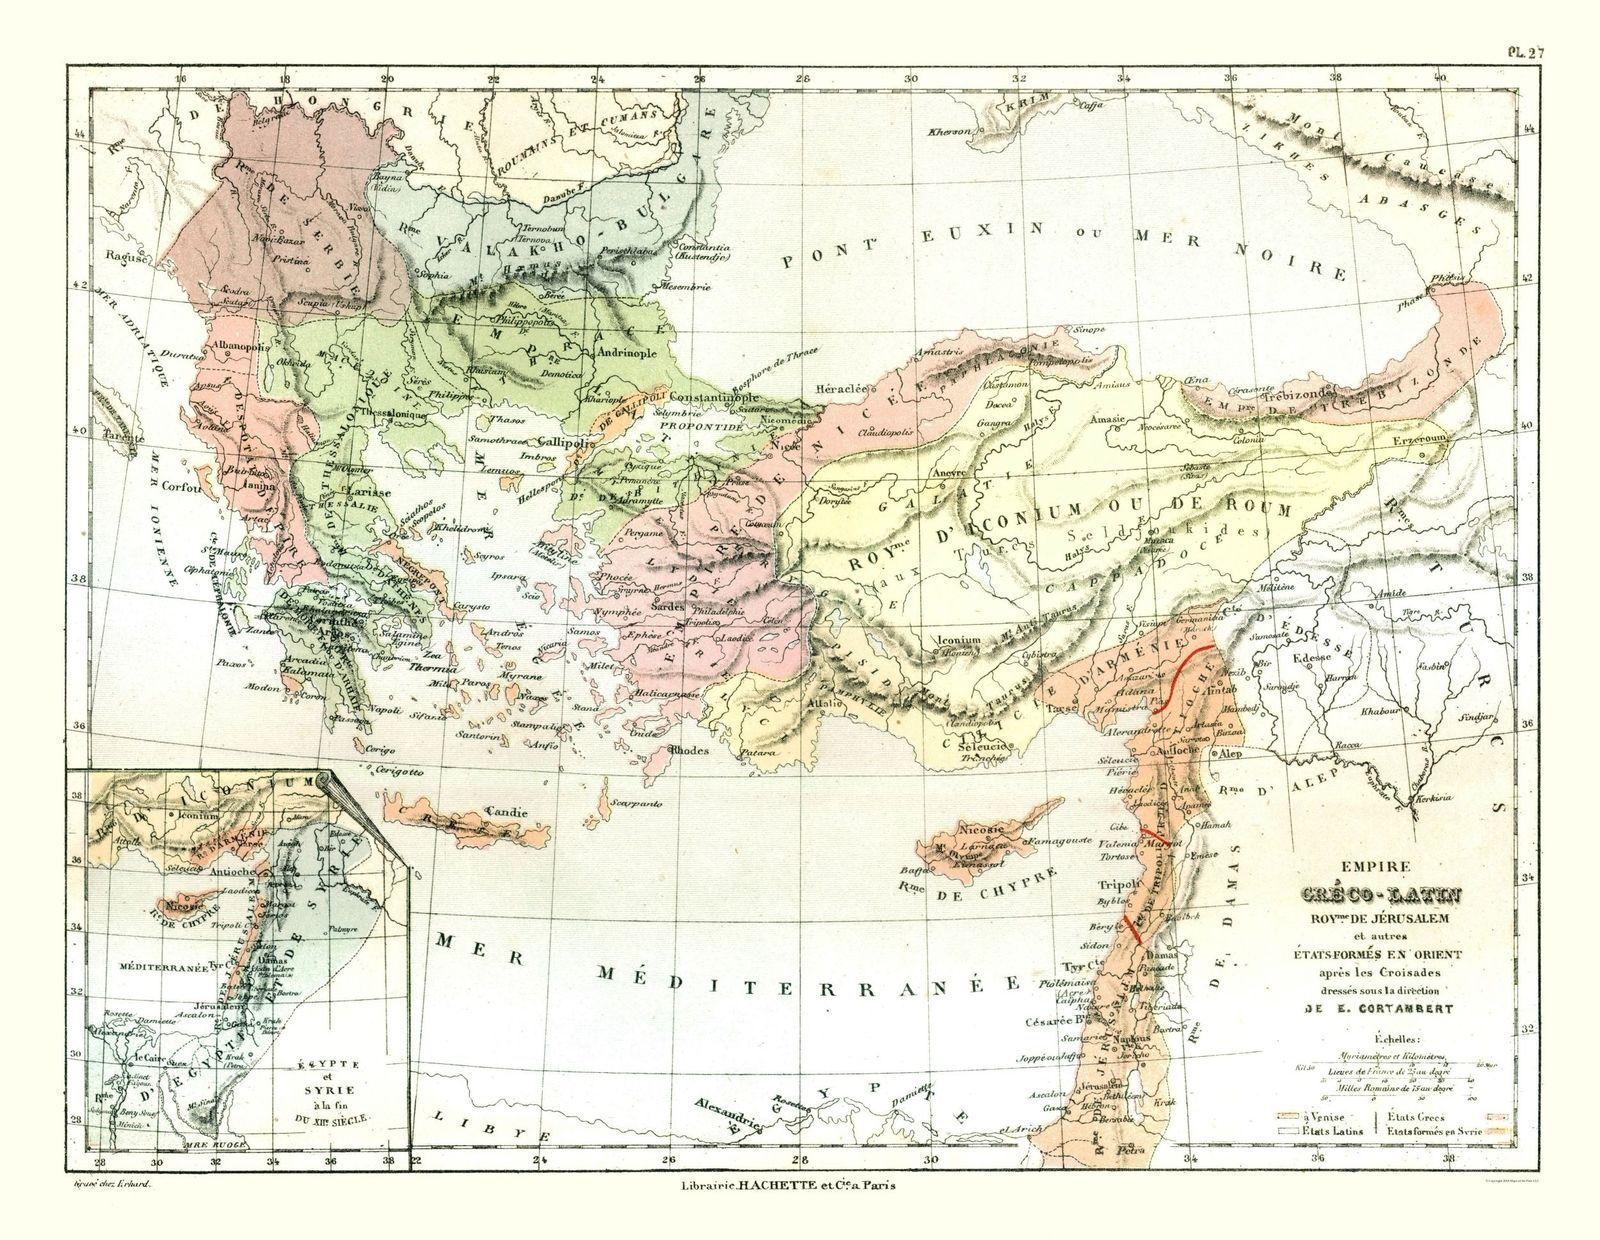 Greco Roman Empire - Cortambert 1880 - 23.00 x 29.69 - $36.58 - $94.00